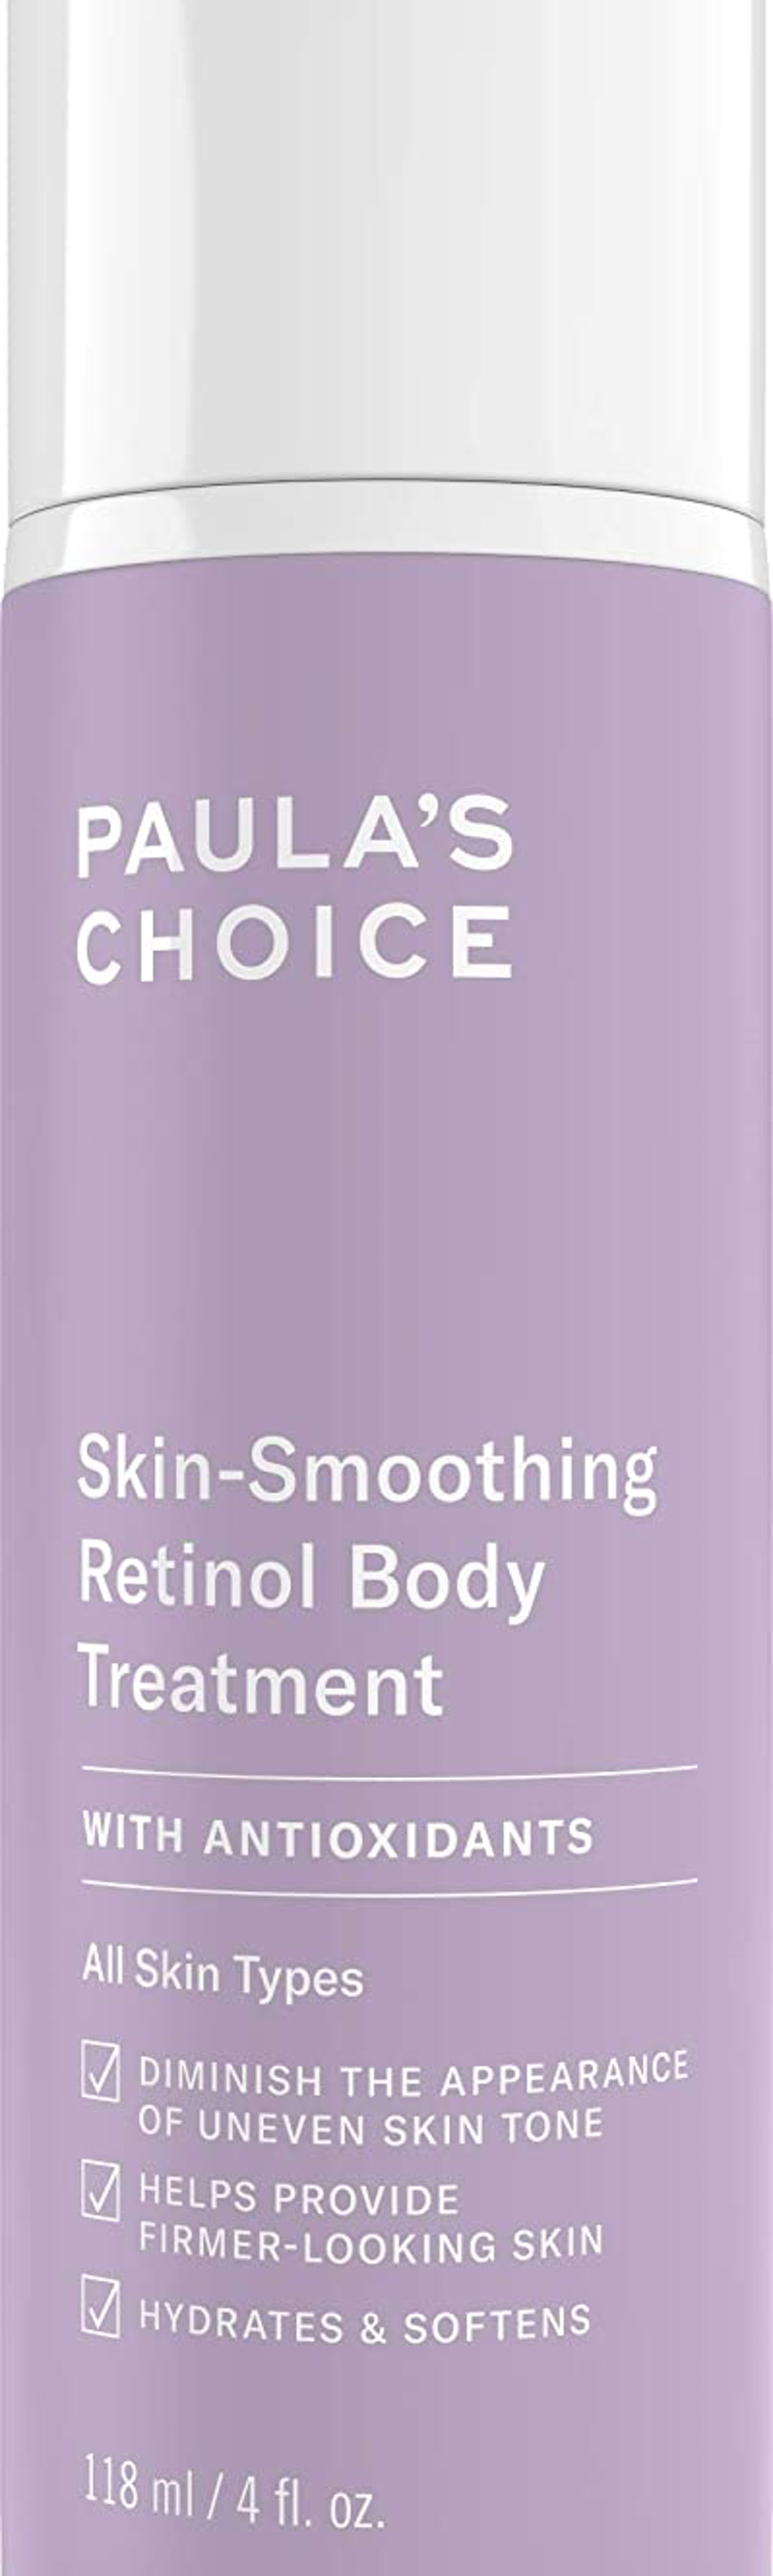 Retinol Skin-Smoothing Body Treatment